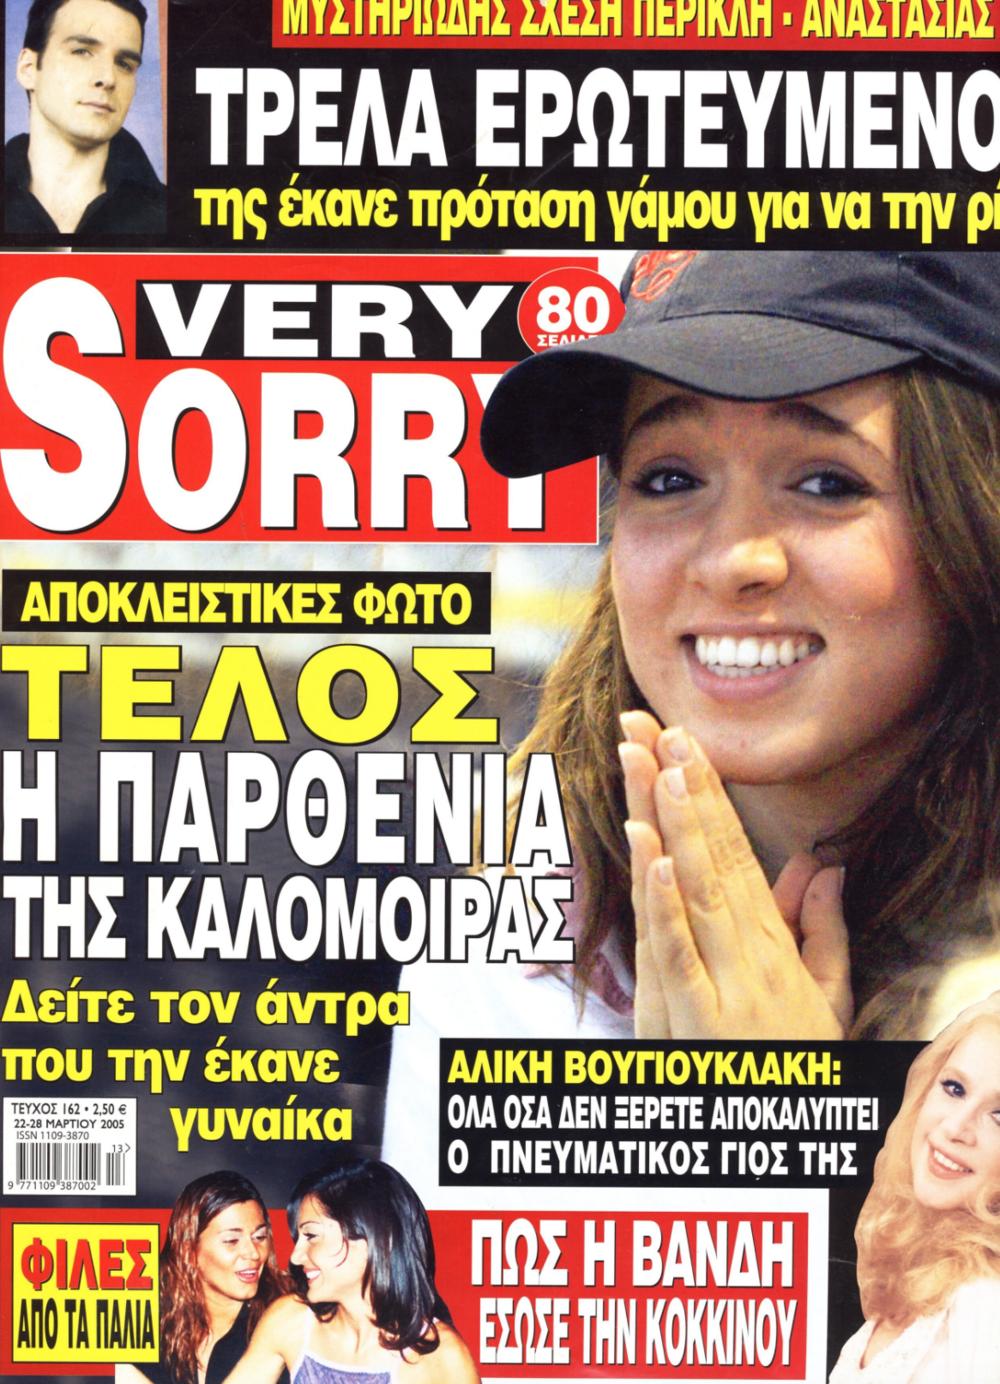 These gossip magazines always make us laugh! #tbt